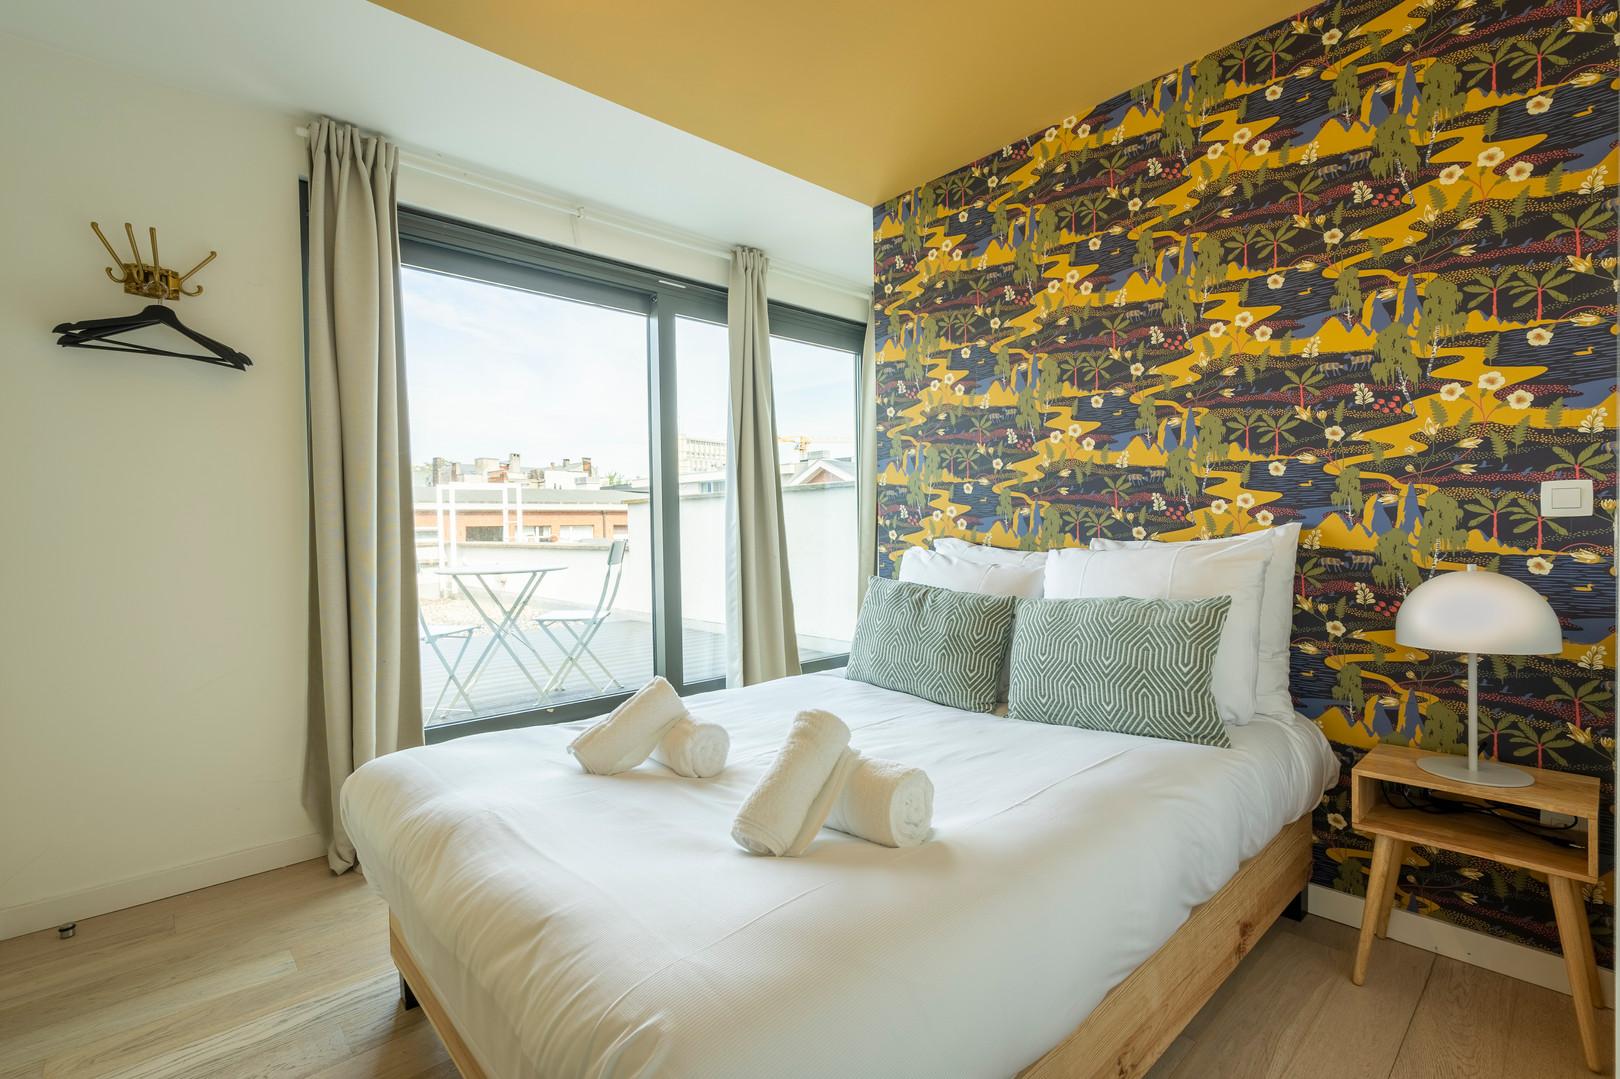 The Indian Yellow - SHWAY 62 - studio bedroom